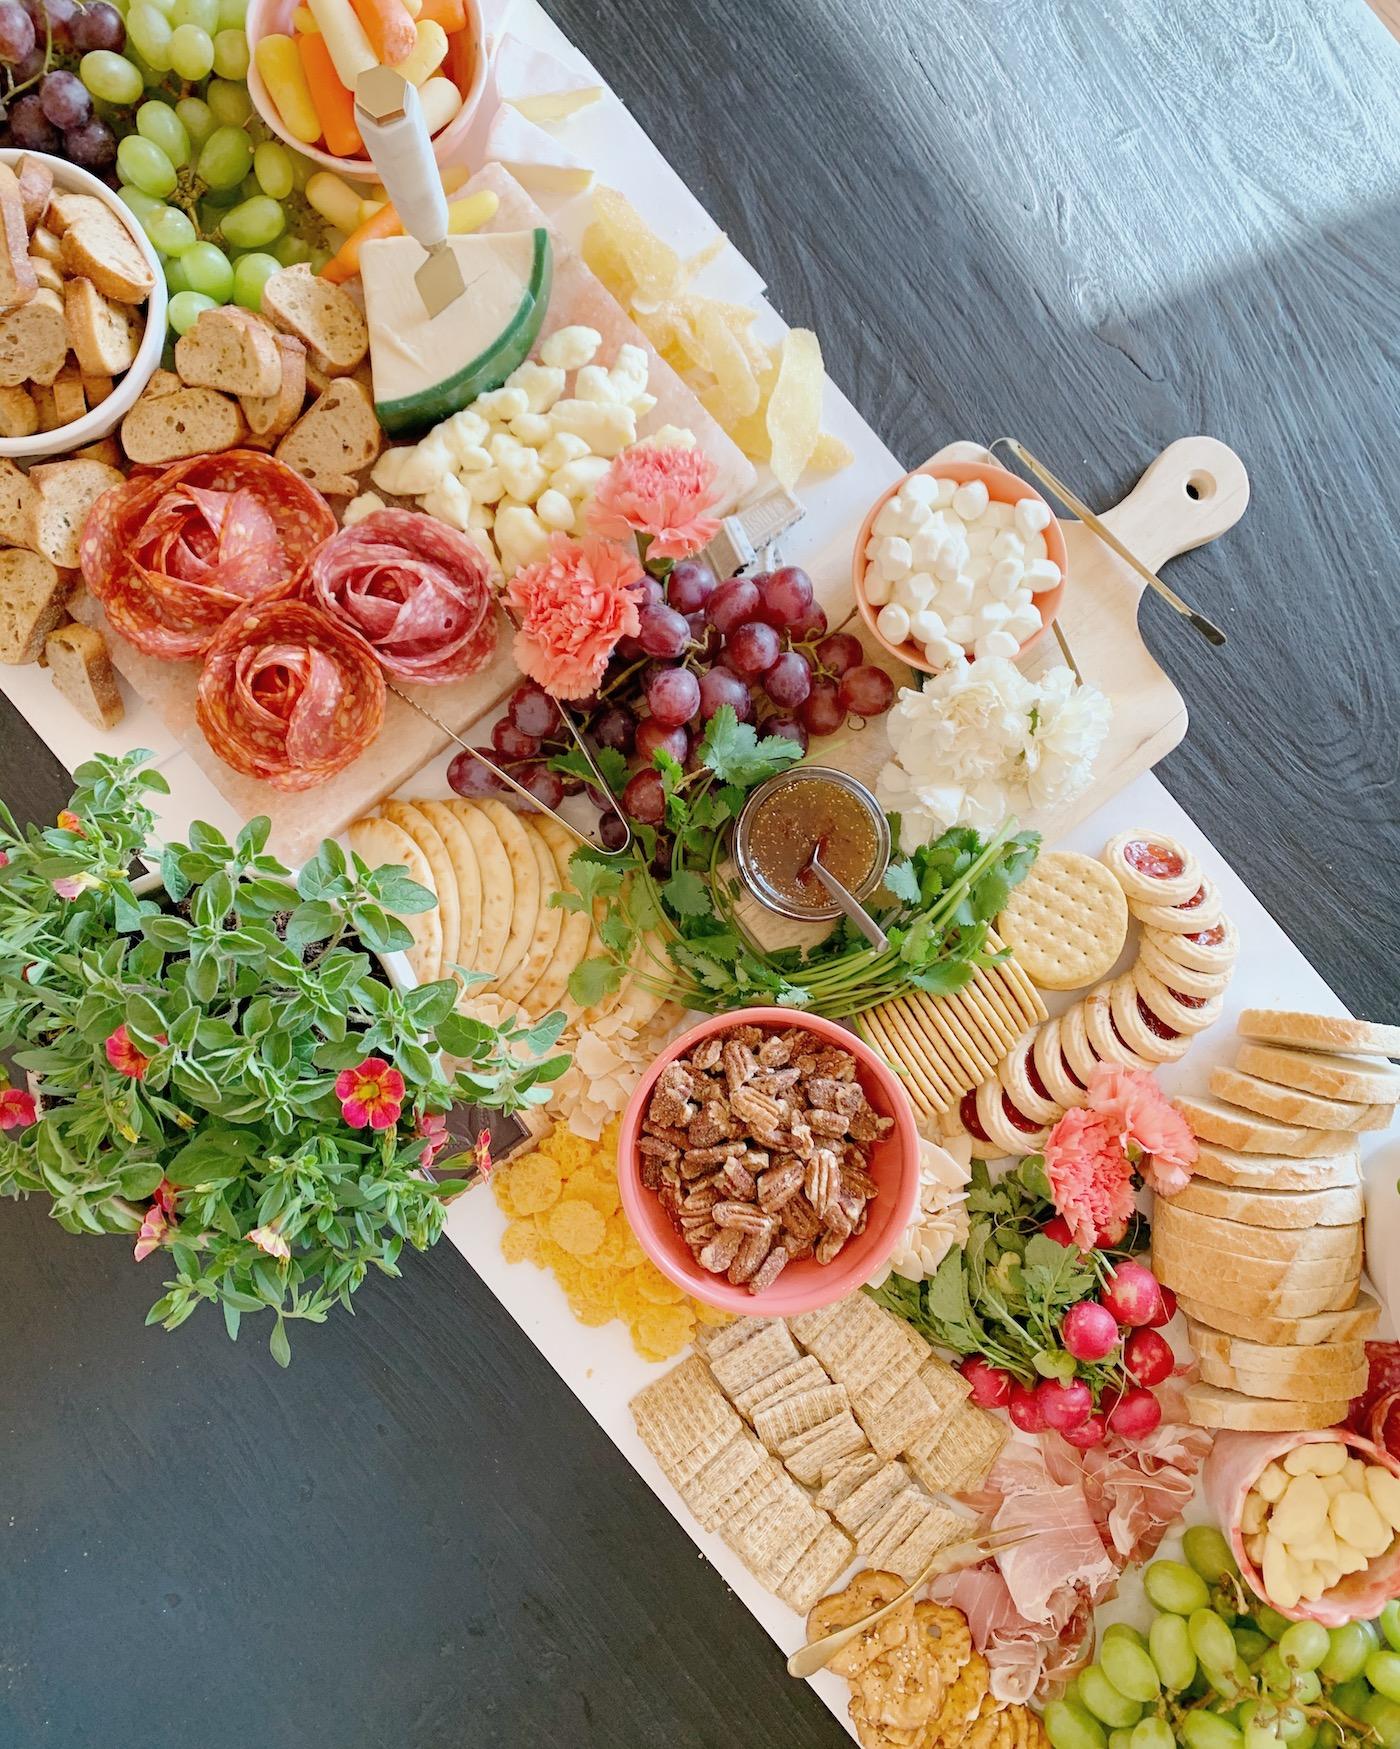 Garden Party Charcuterie Table